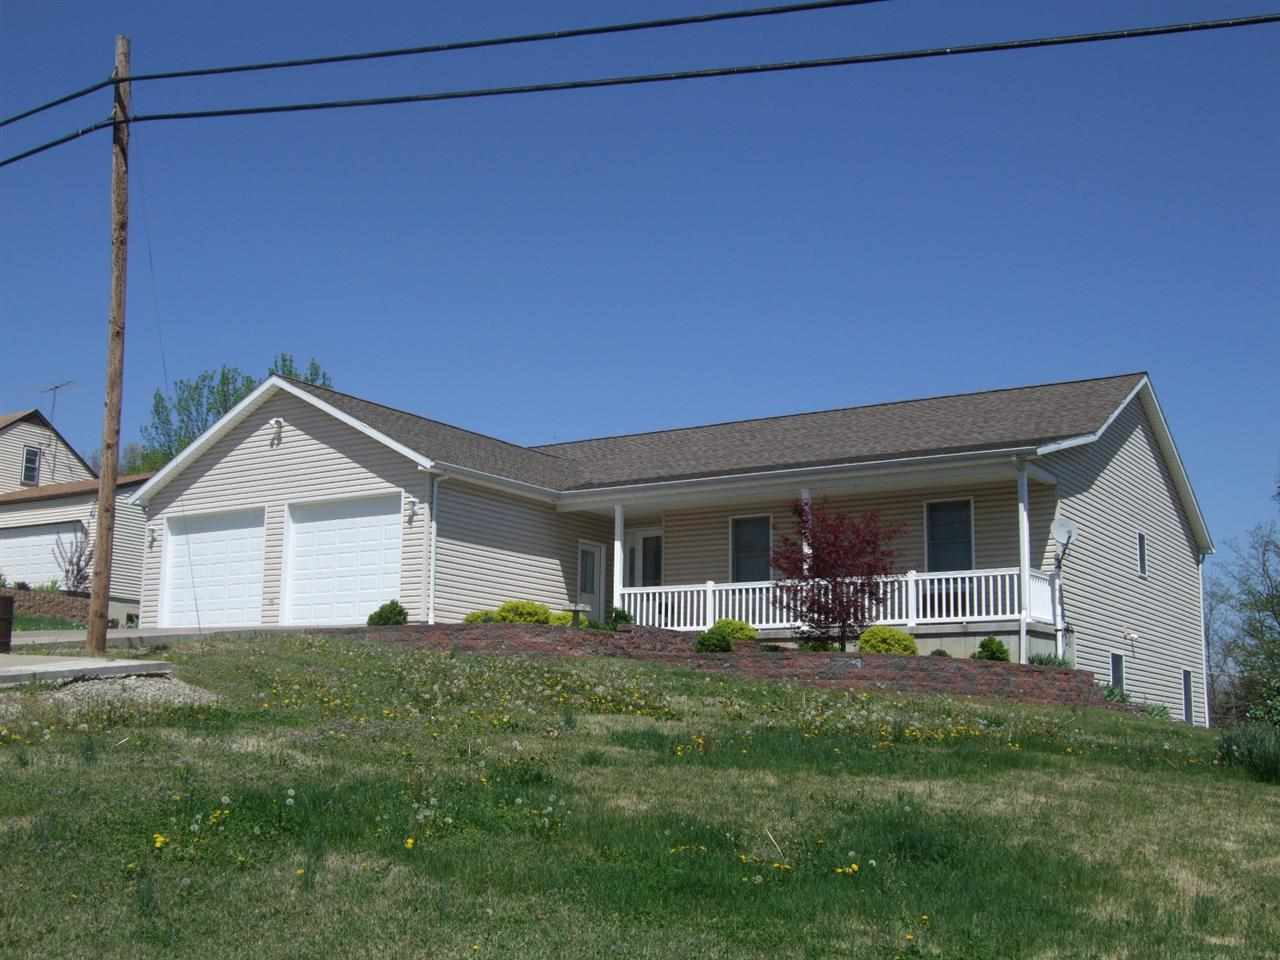 Real Estate for Sale, ListingId: 25487097, Bloomsdale,MO63627